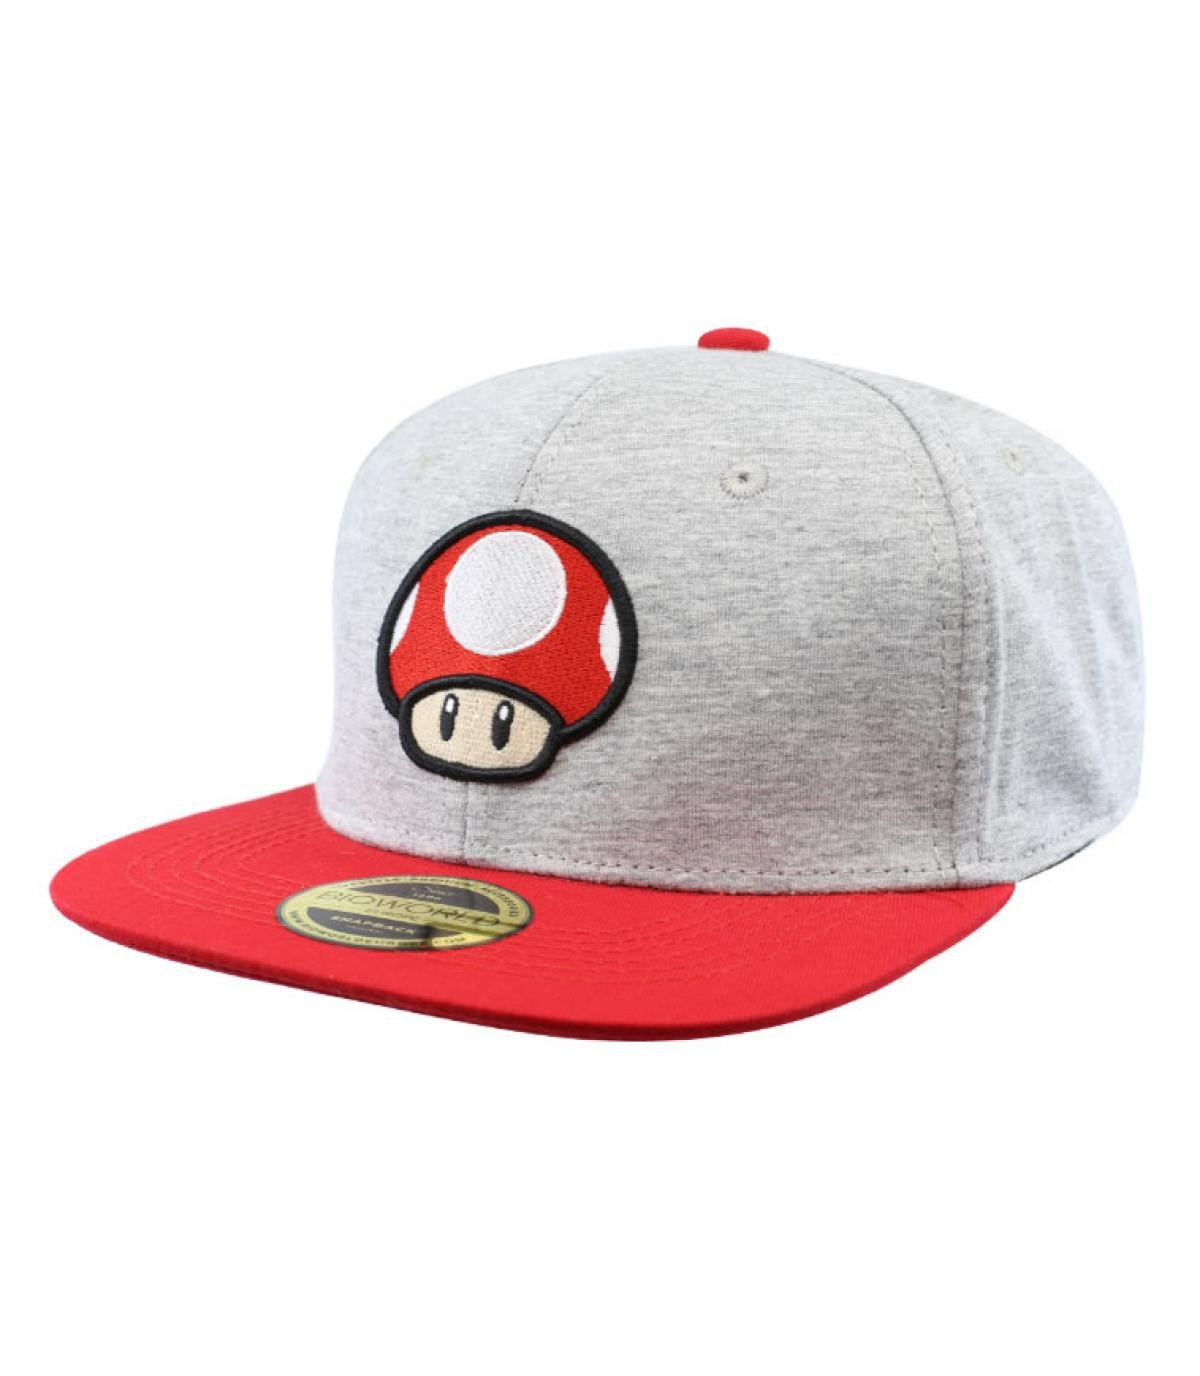 mushroom snapback Mario - Snapback Mushroom Nintendo by Bioworld ... 548cf259e66